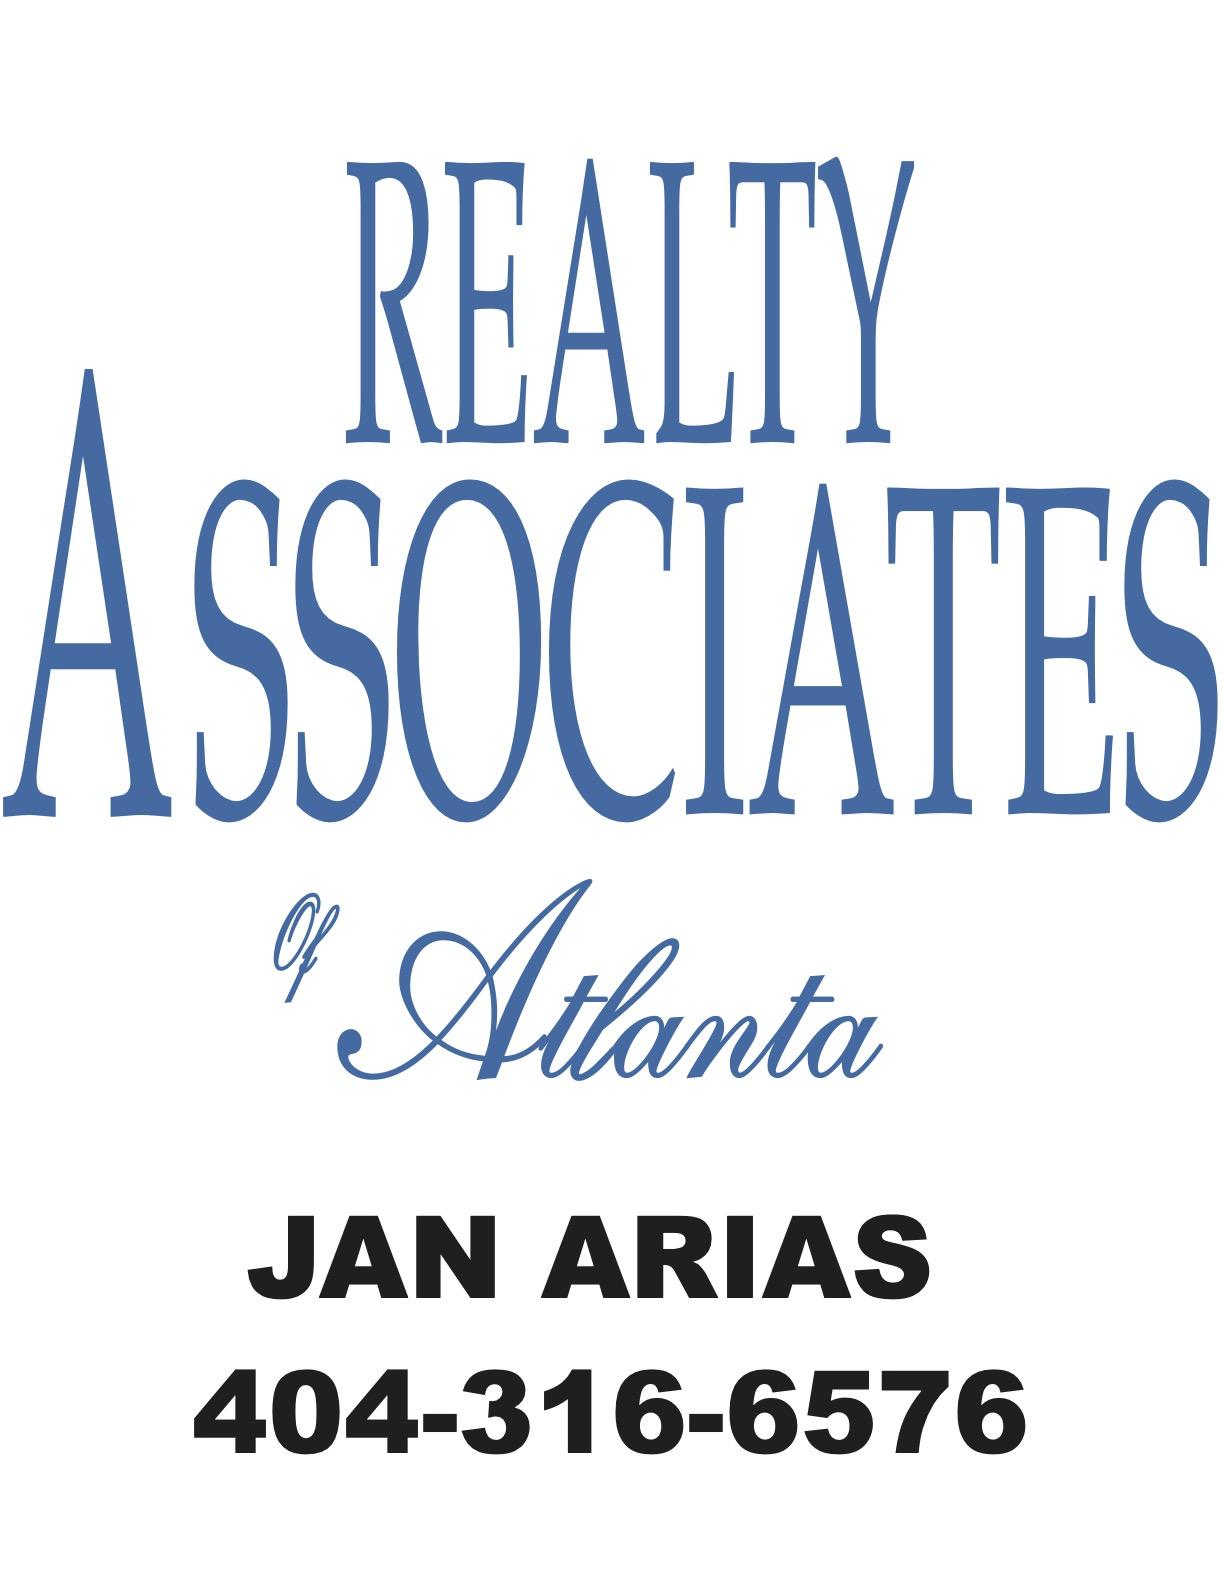 Realty Associates of Atlanta -Jan Arias